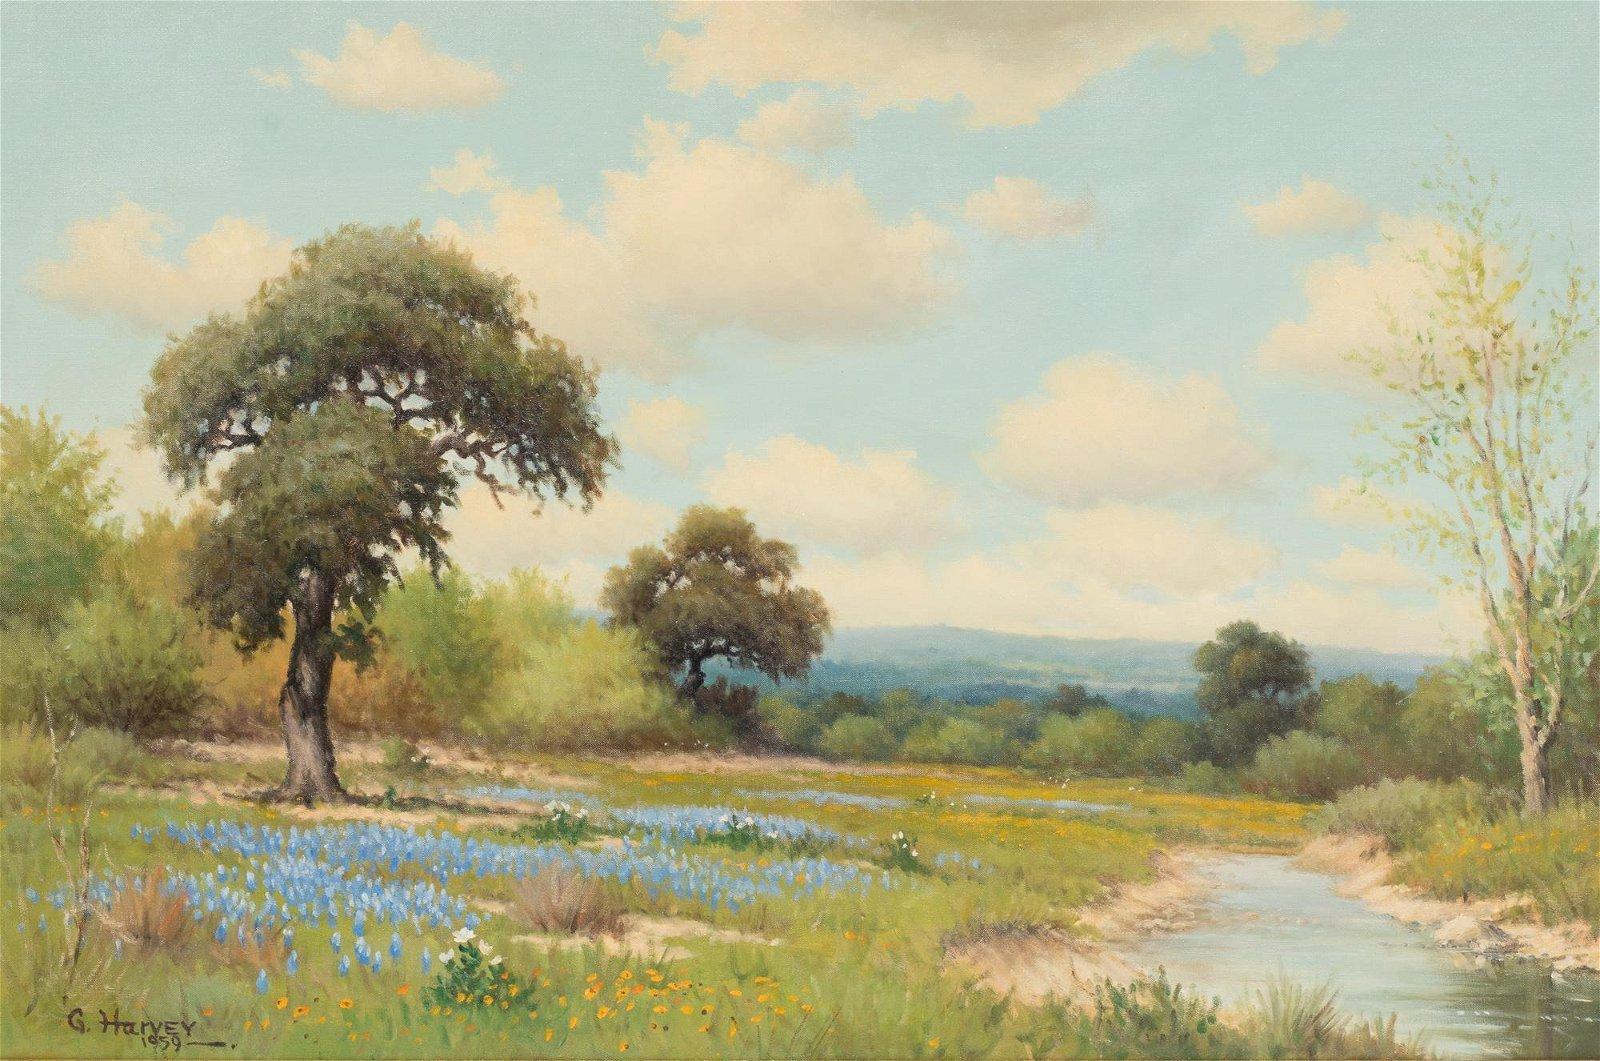 G. Harvey (1933-2017), Bluebonnets, 1959, oil